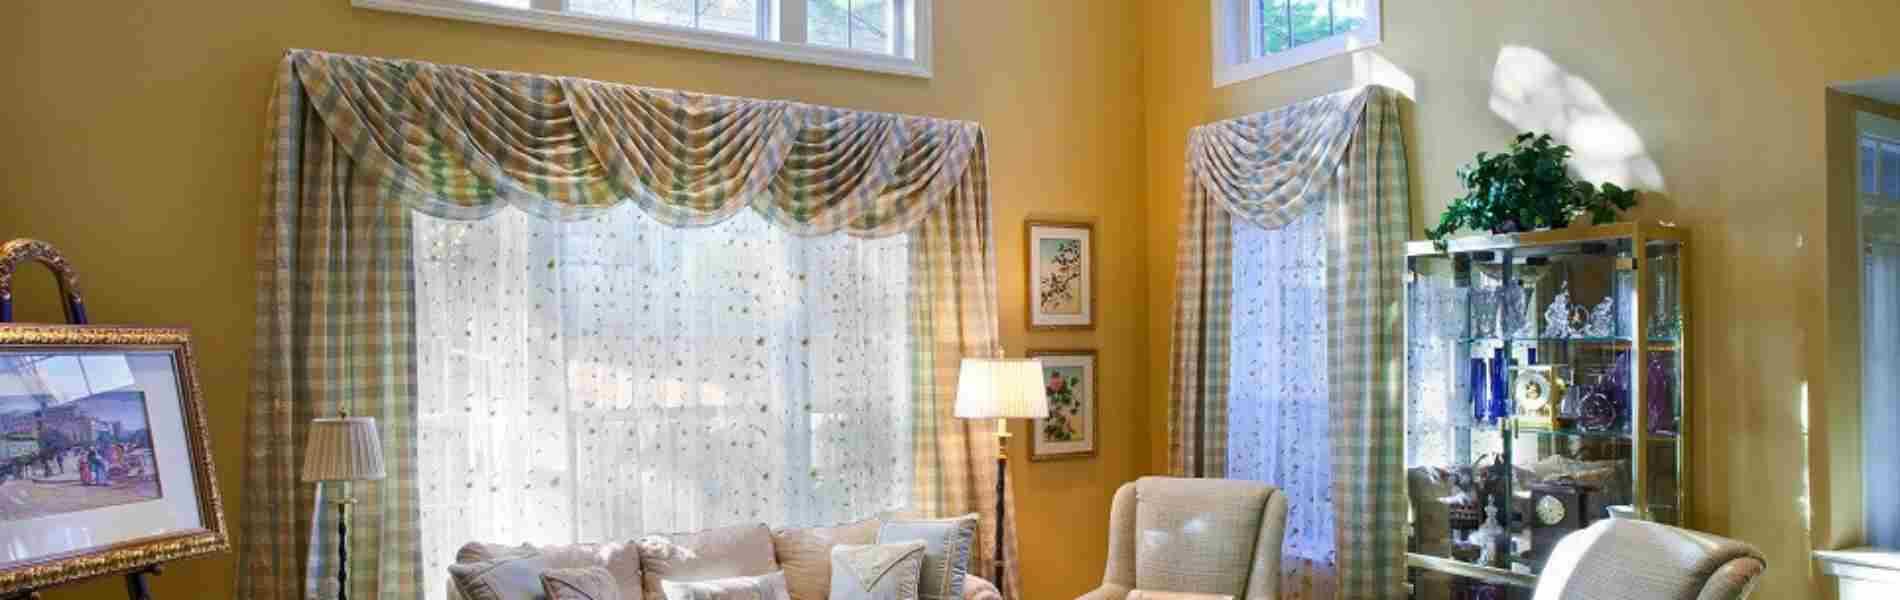 kap10-14 horizontal view of the living room designed by Tammy Ka